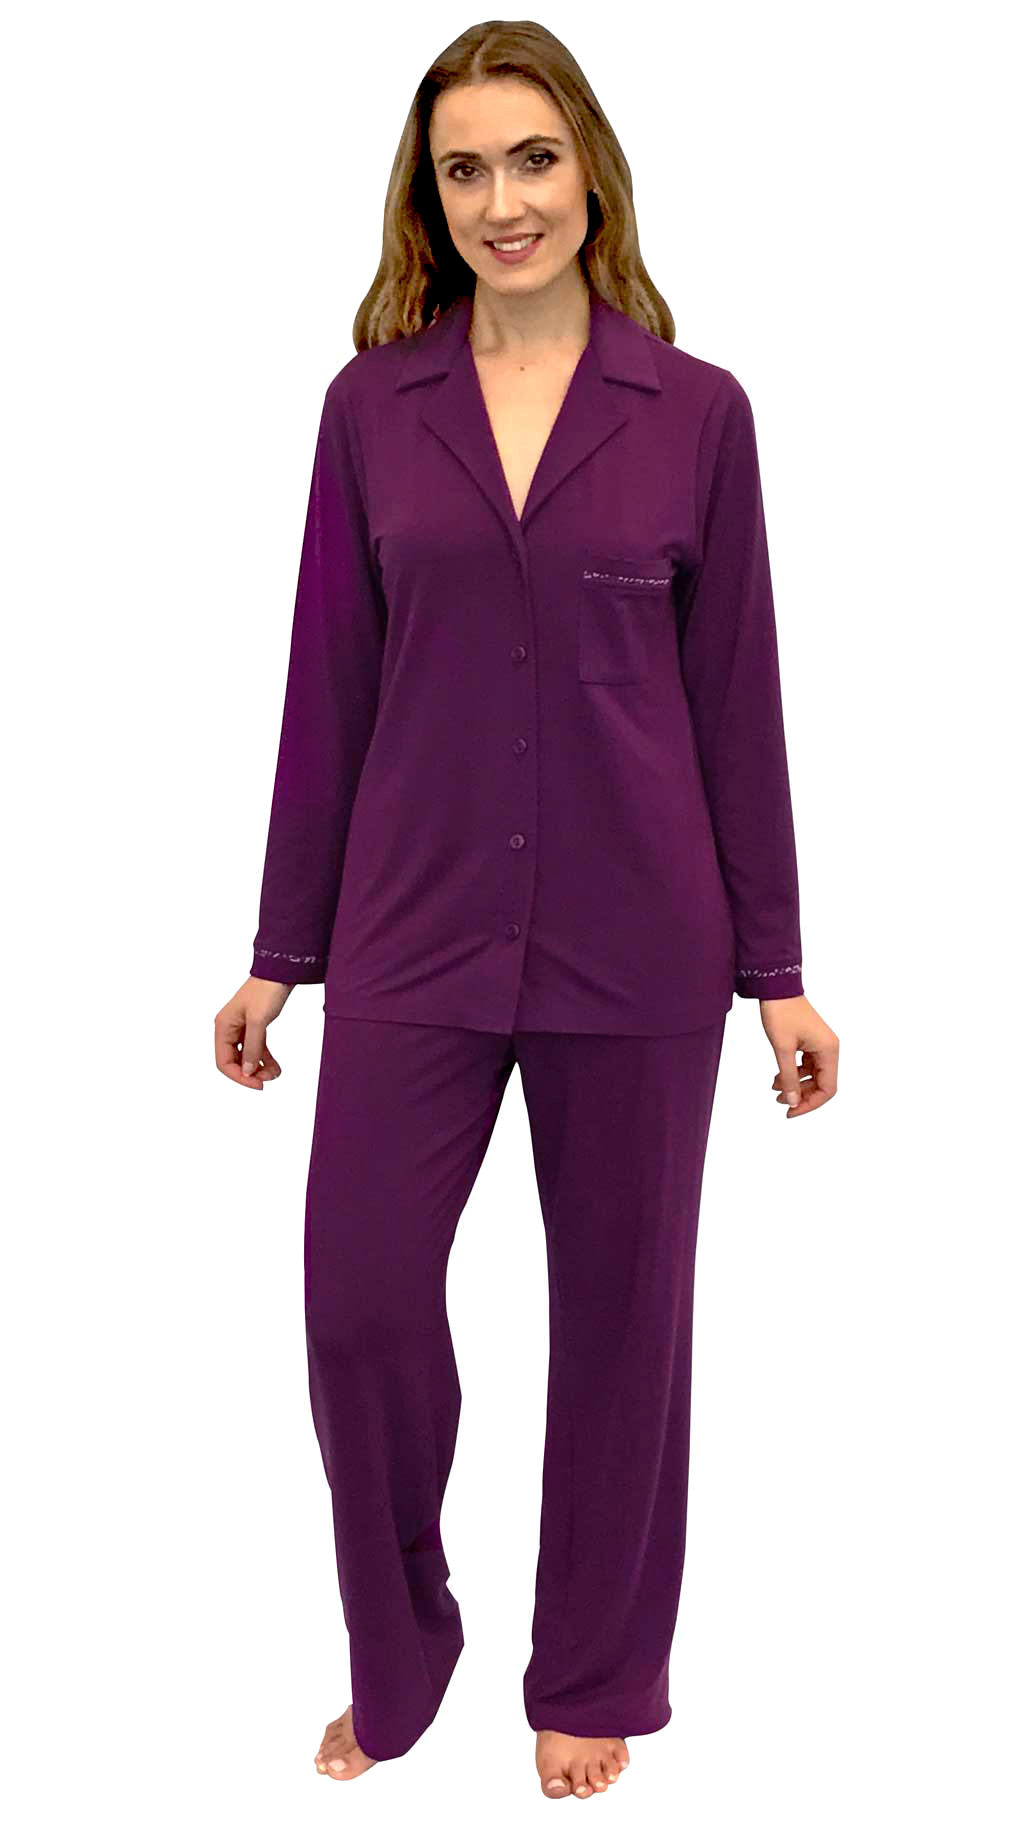 longe sleeved notch collar pajama set from Shadowline